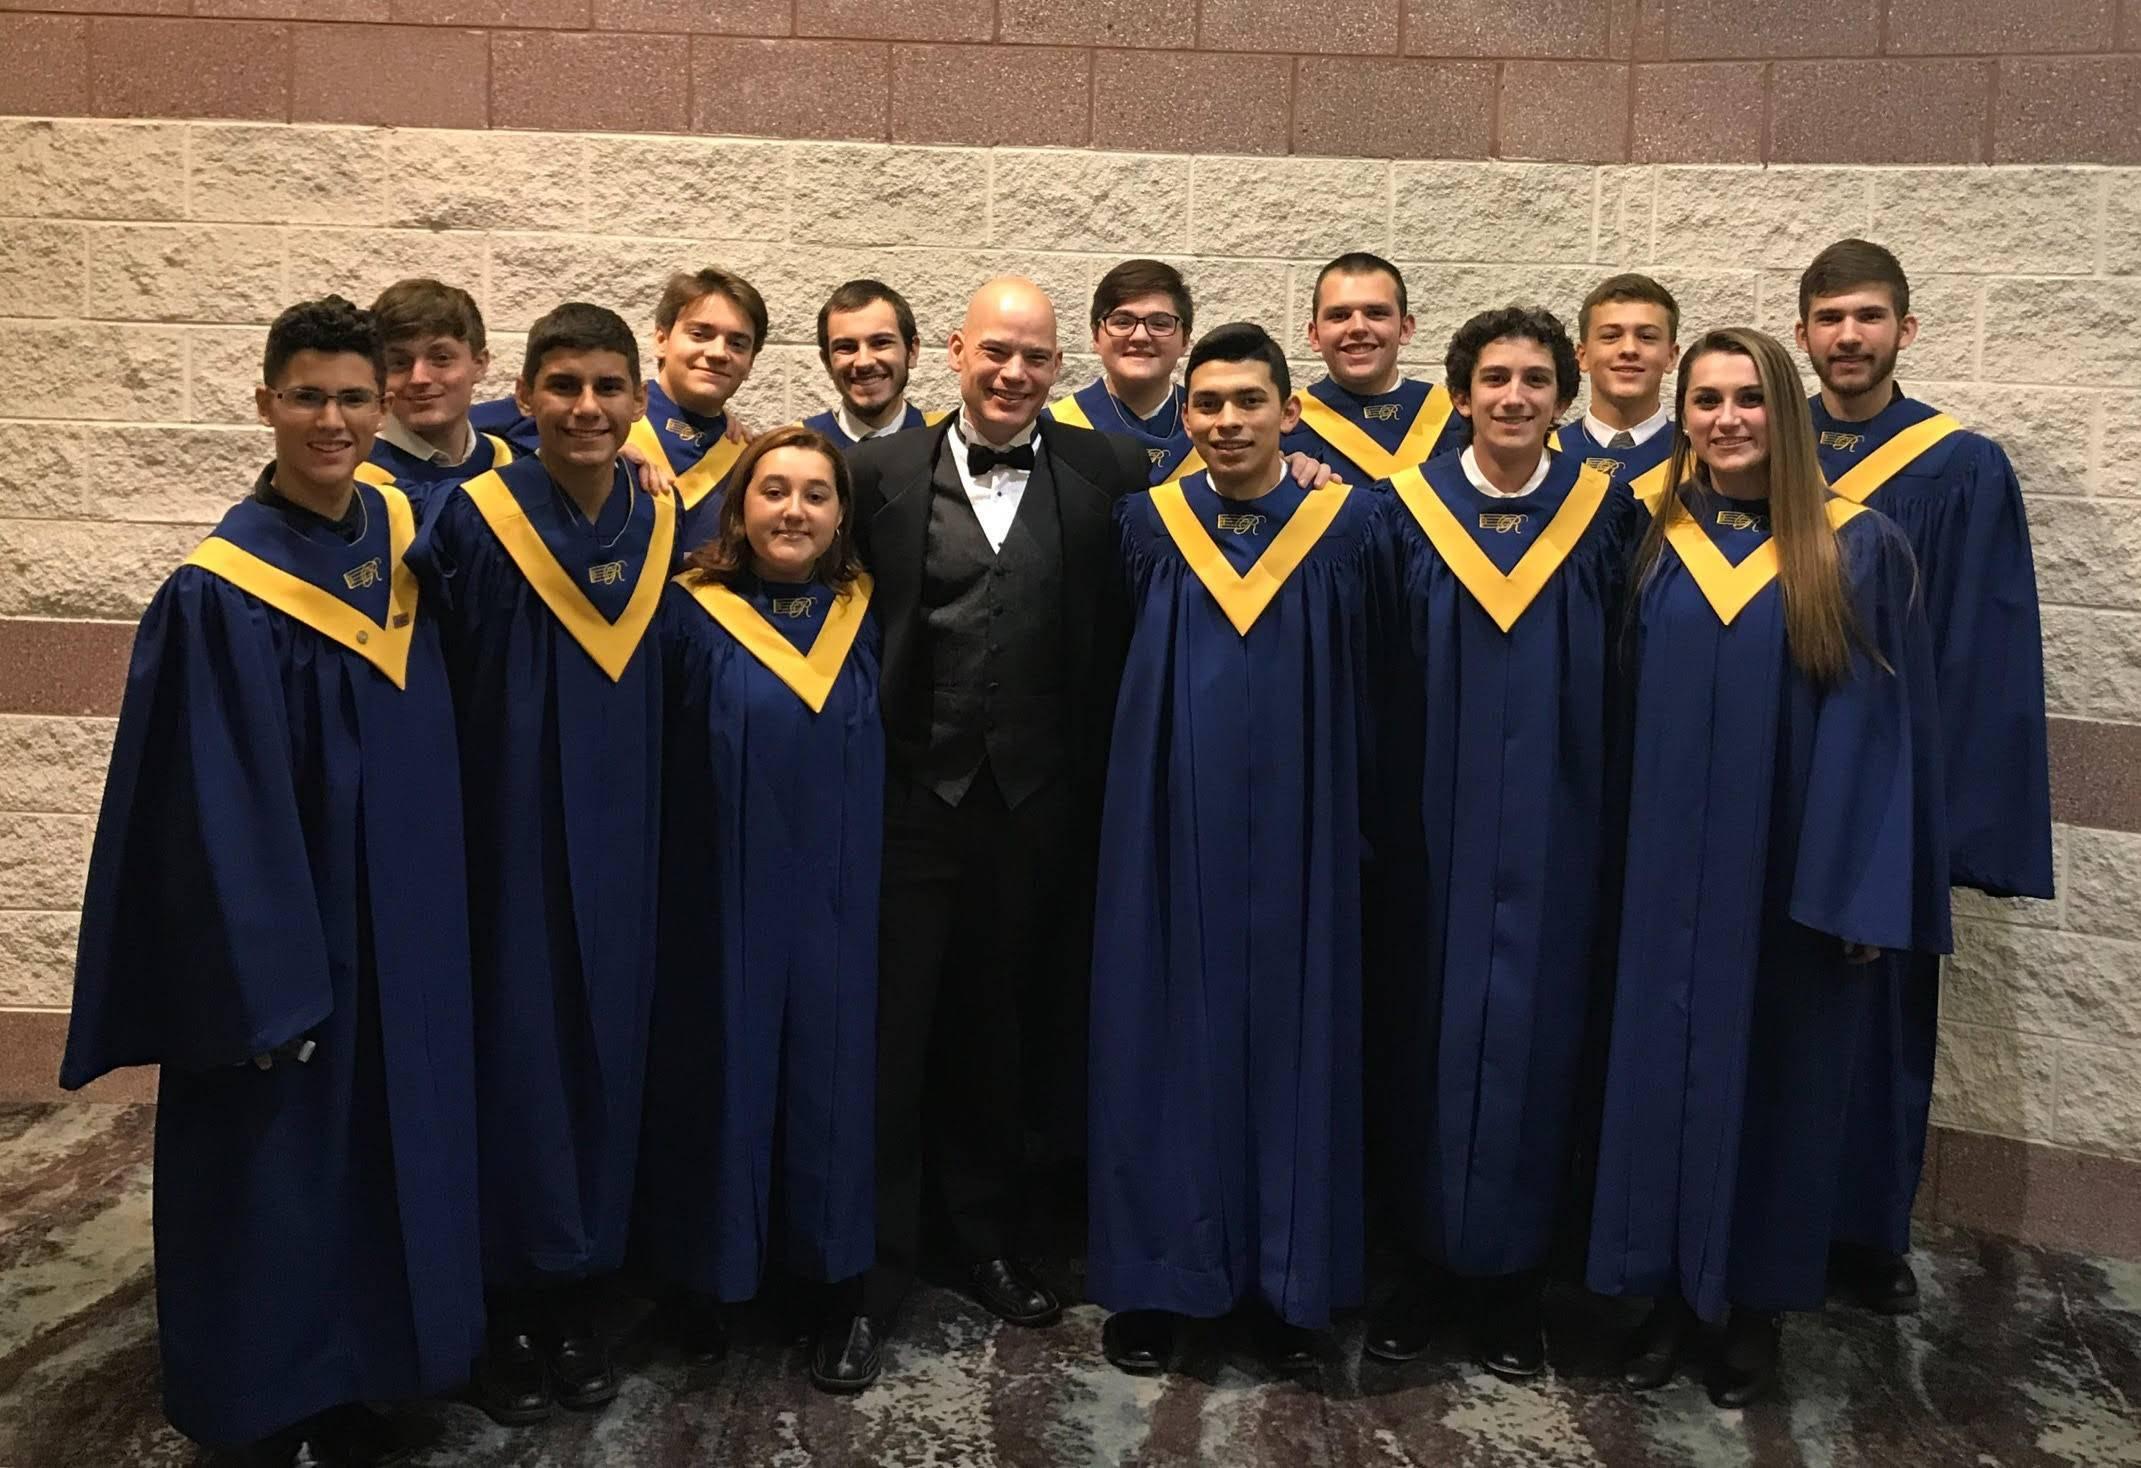 e57db171d227dde70674_Roxbury_Choir_Director_and_Students_Honored_at_All_State_Choir.jpg